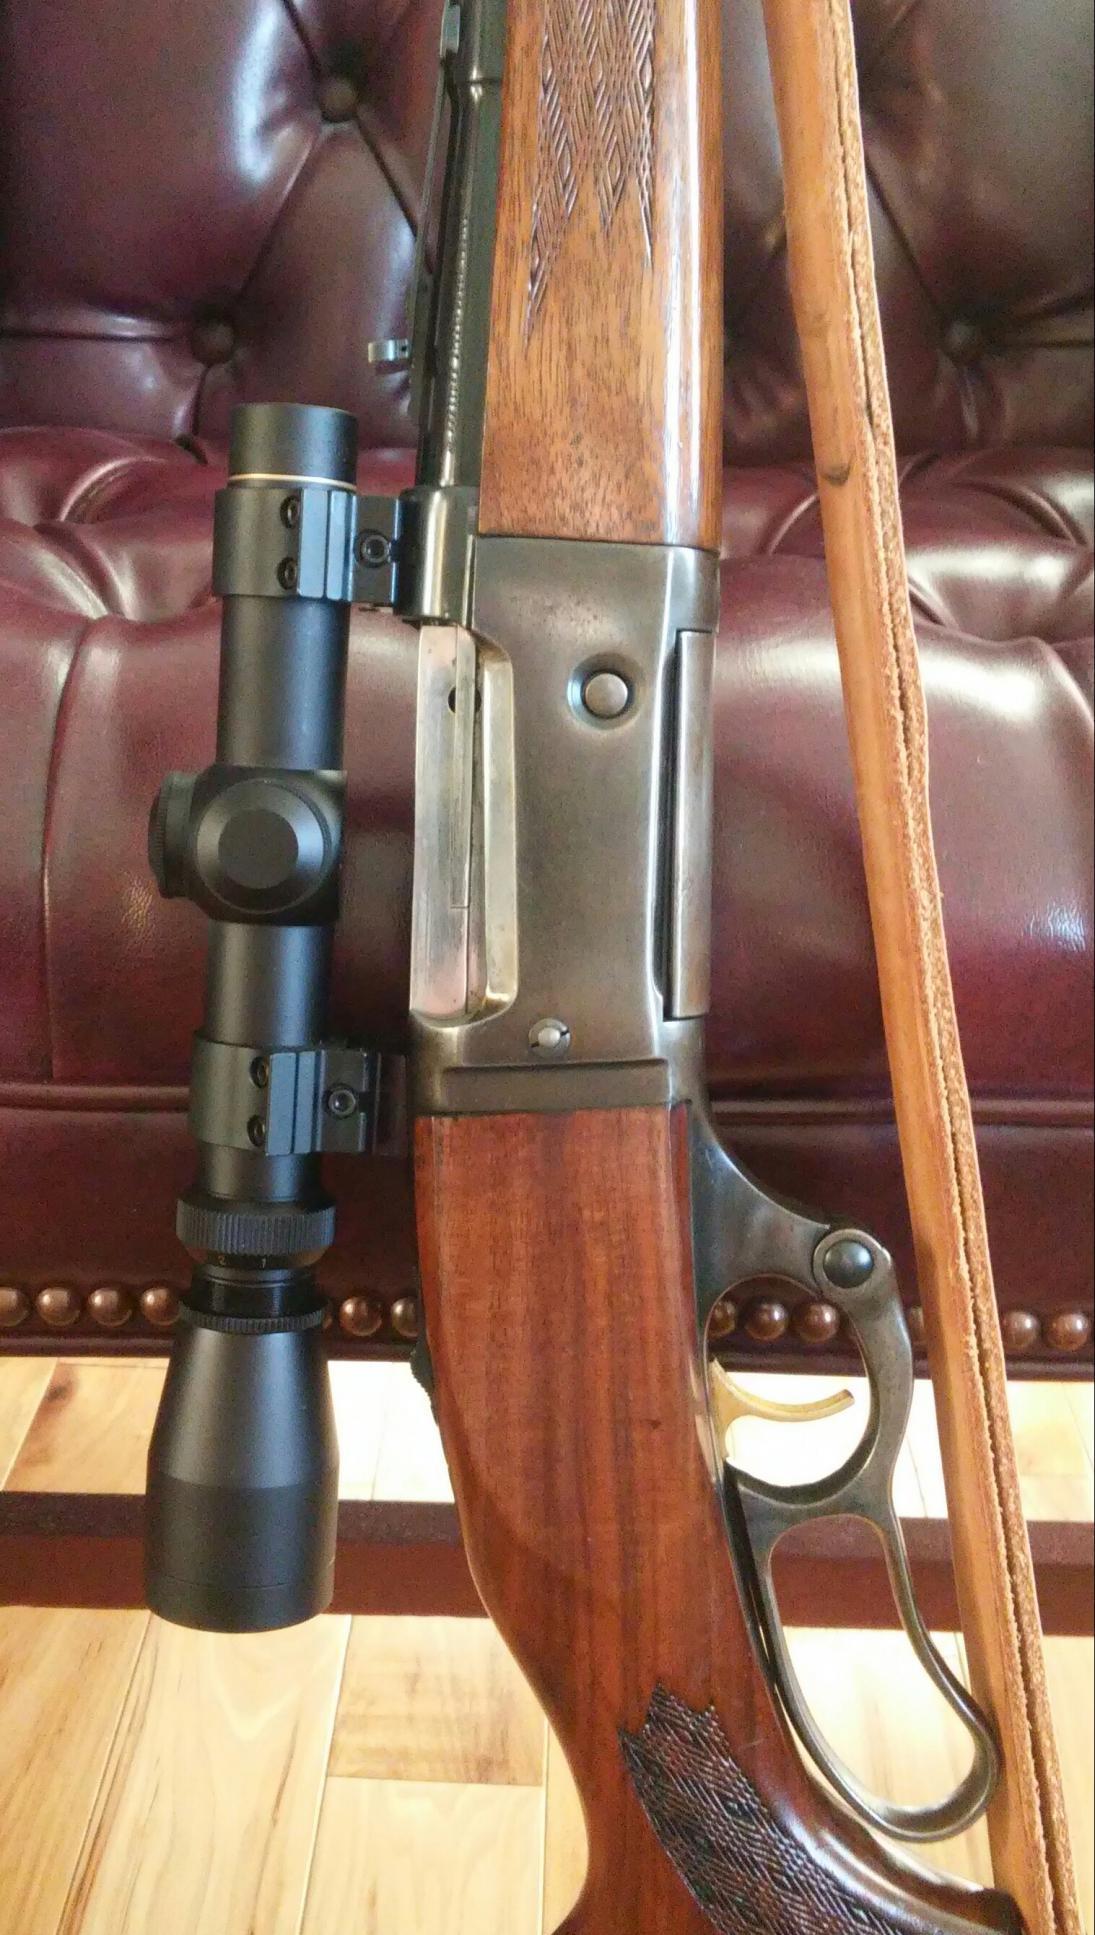 savage 99 scope mounting-0213170735a-1.jpg